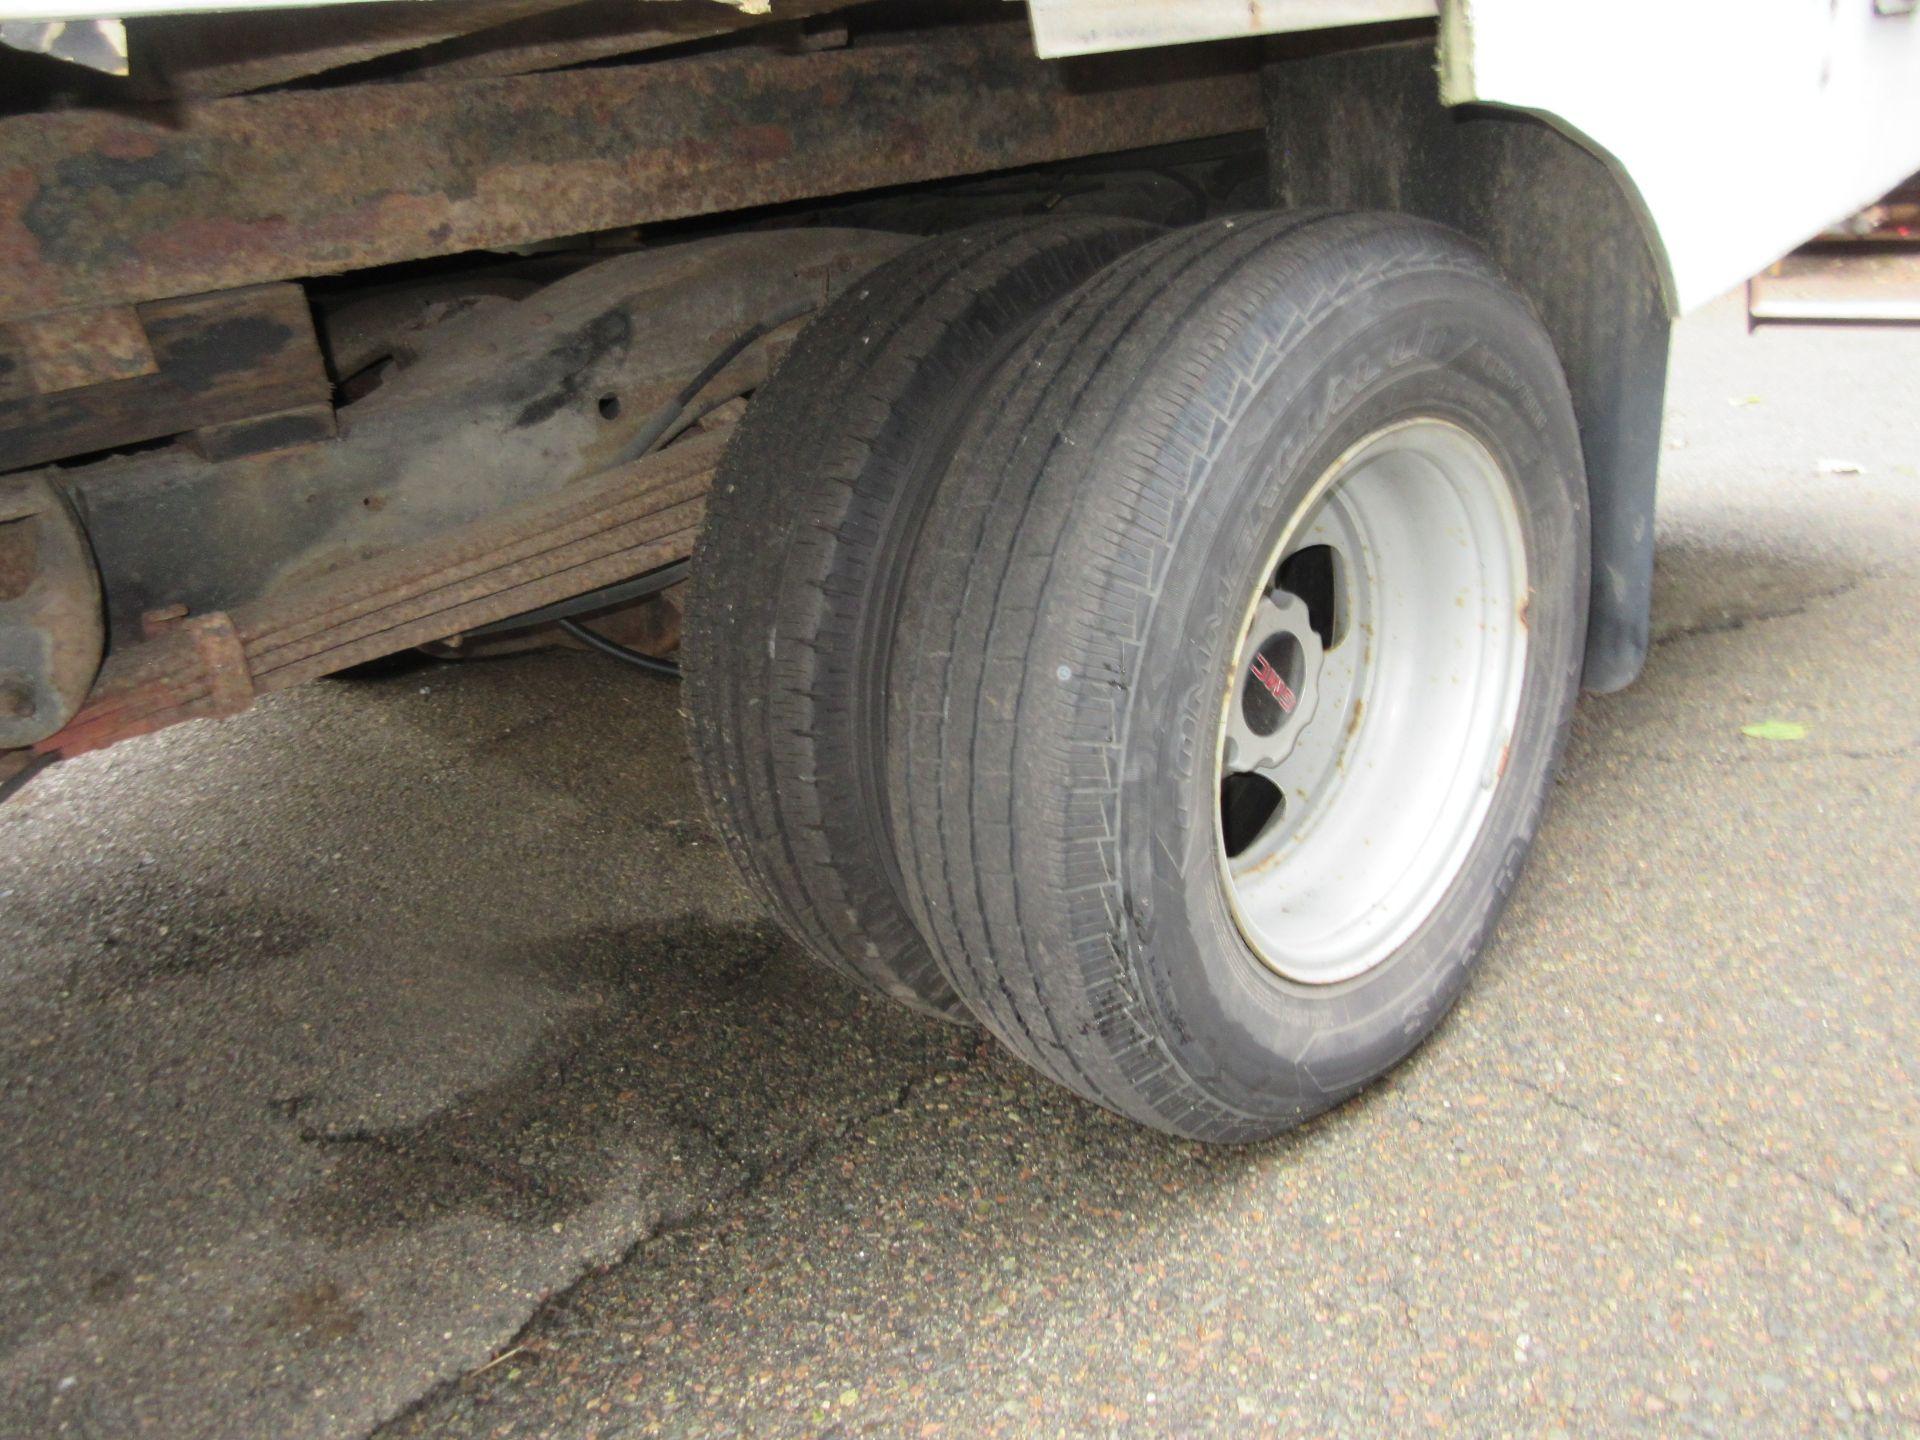 2004 GMC Savana 3500 Box Truck 2WD 8 Cylinders U 6.0L FI OHV 364 CID, VIN 1GDHG31U841236876 - Image 7 of 7